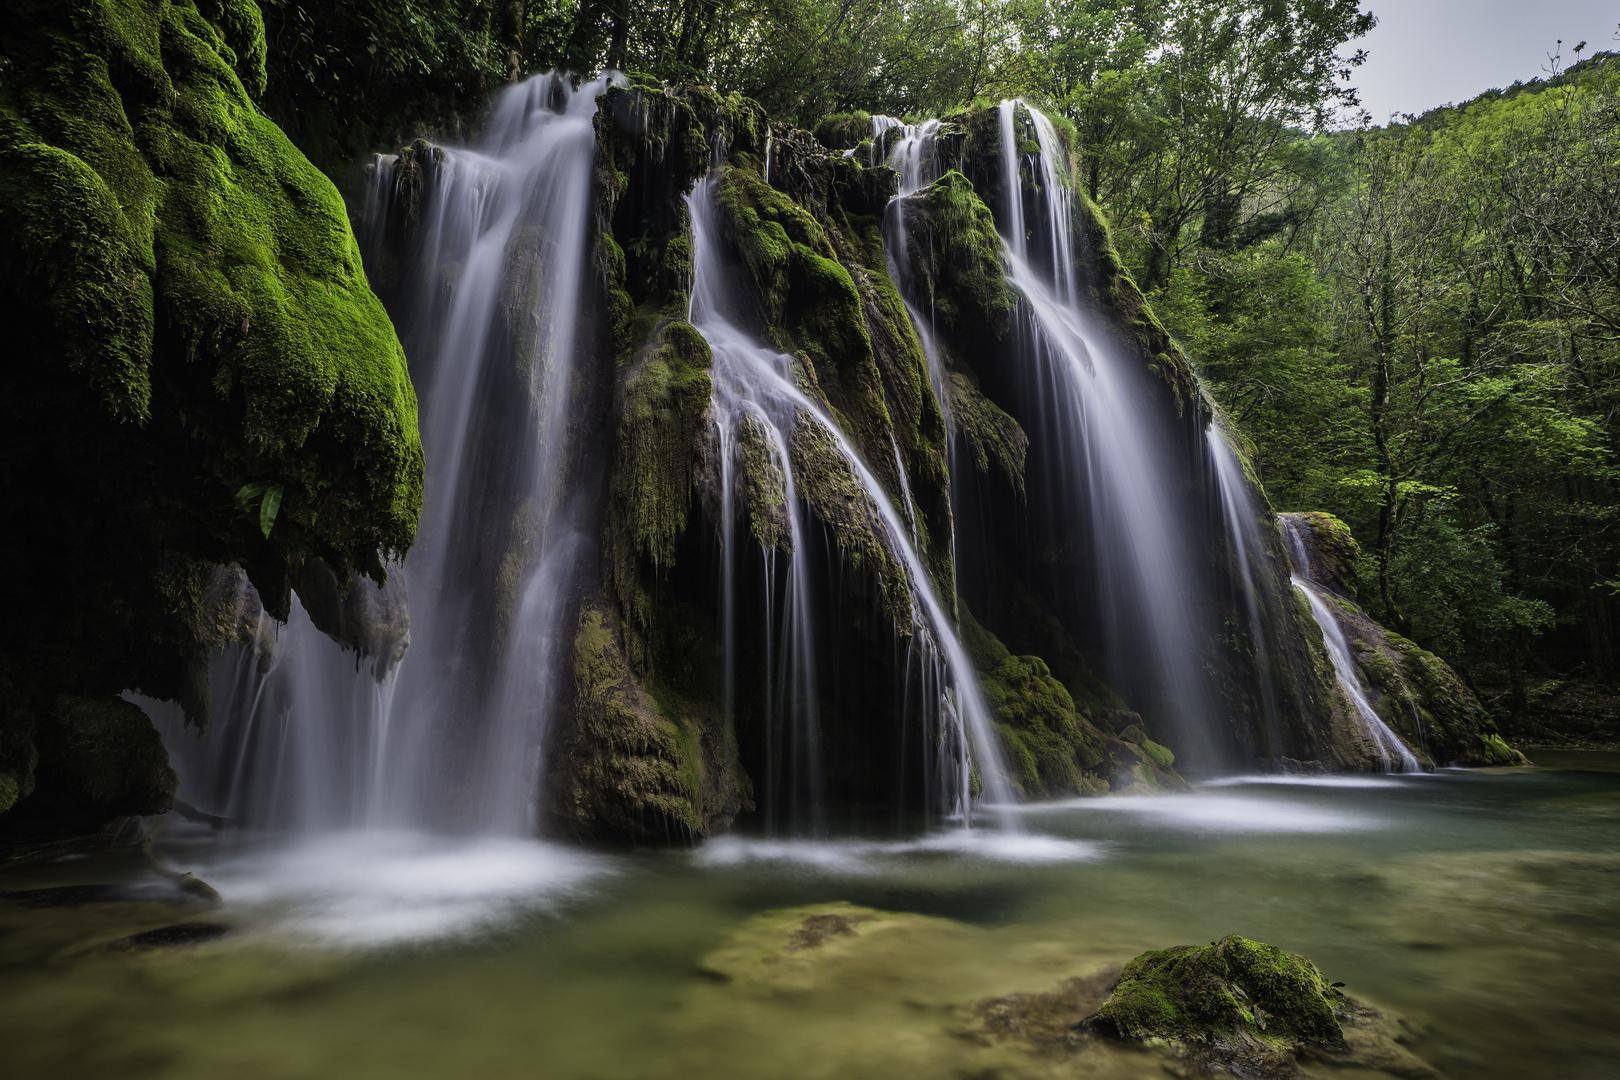 Cascades des Tufs - II